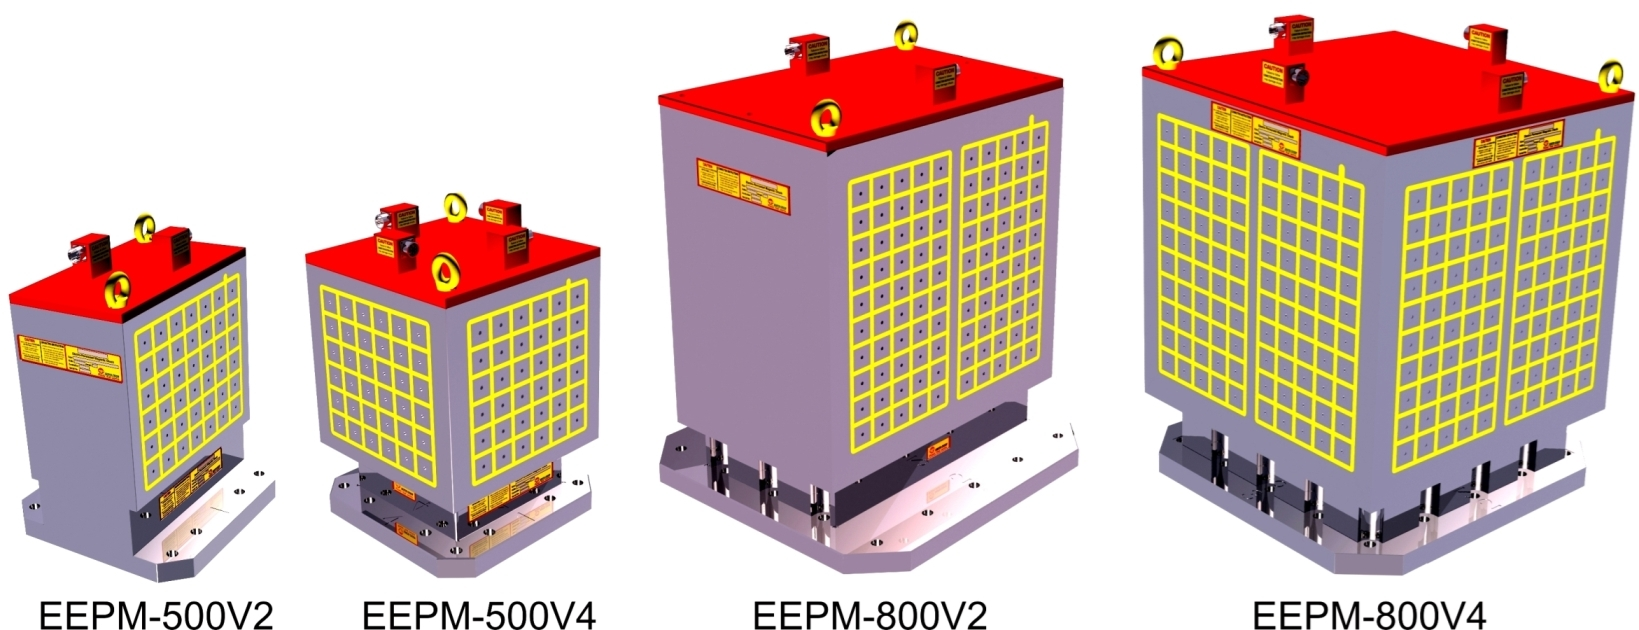 <span>永磁式電控磁盤</span><span>EEPM-V 系列</span>